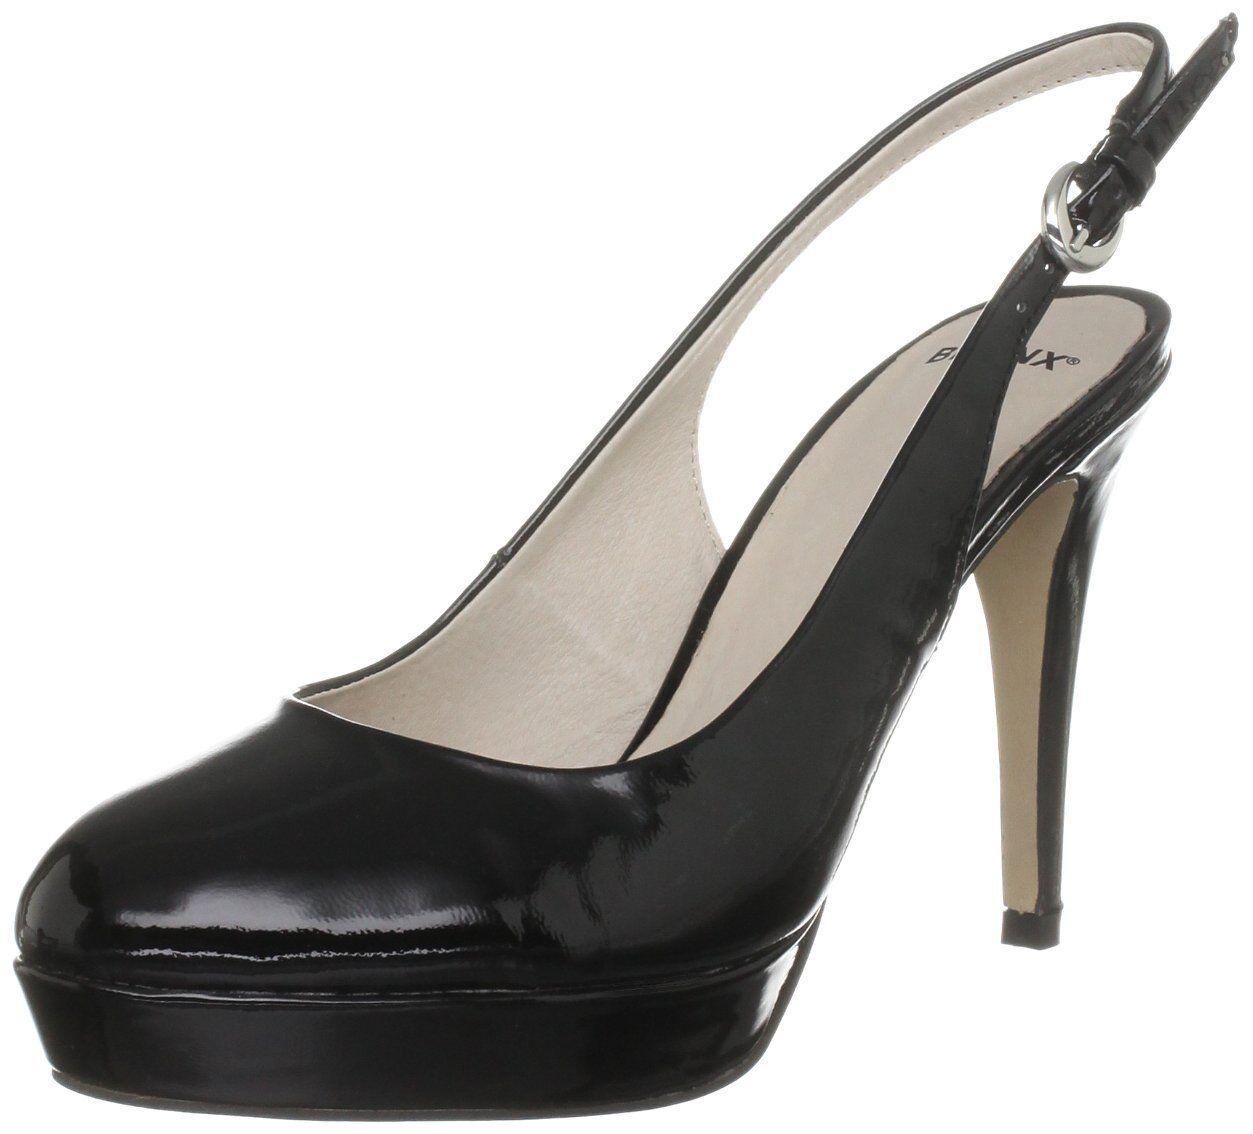 BNWB SIZE 3 5 7 BRONX BLACK PATENT REAL LEATHER SLINGBACK COURT Schuhe